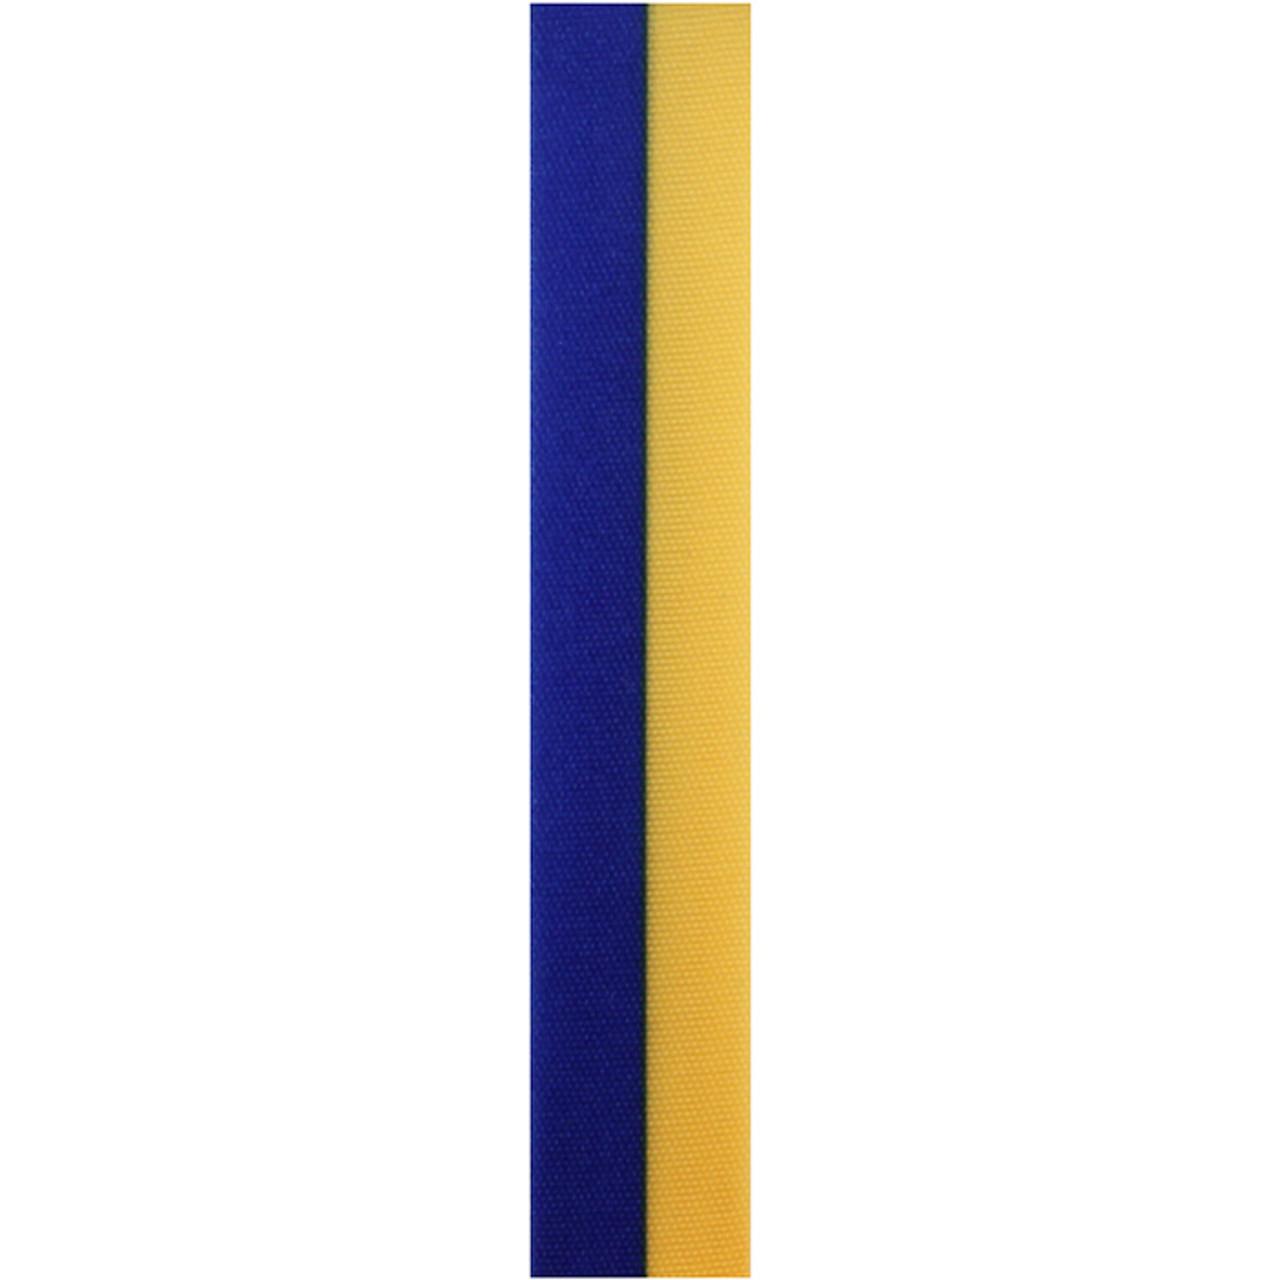 Royal and Gold Vertical Striped Ribbon